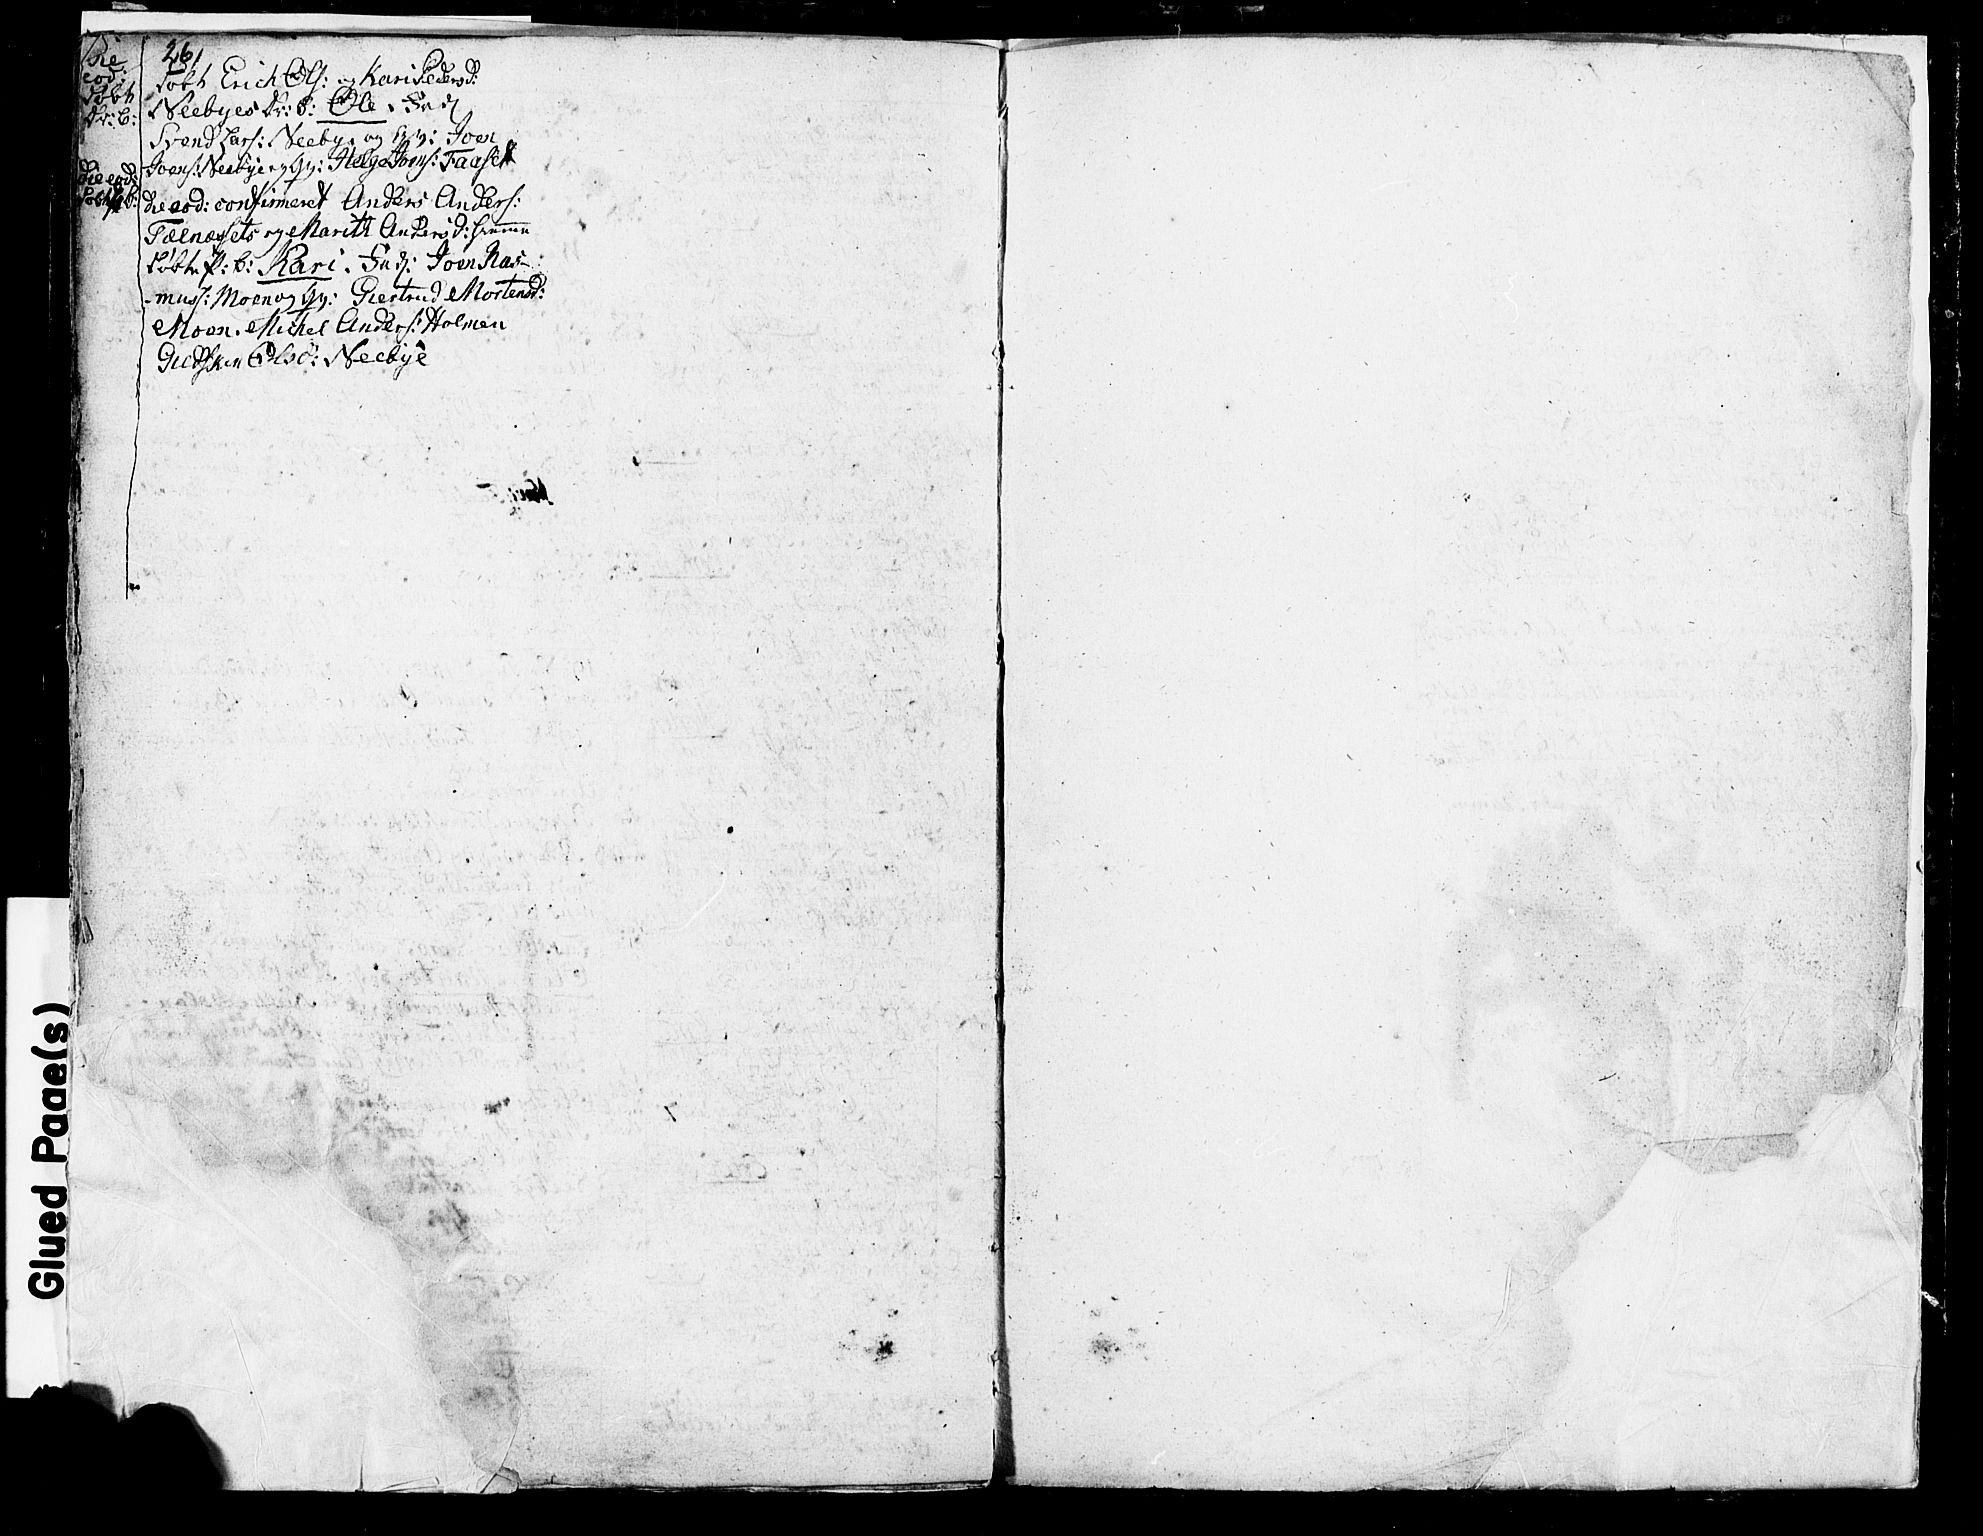 SAH, Tynset prestekontor, Ministerialbok nr. 13, 1784-1790, s. 26-27